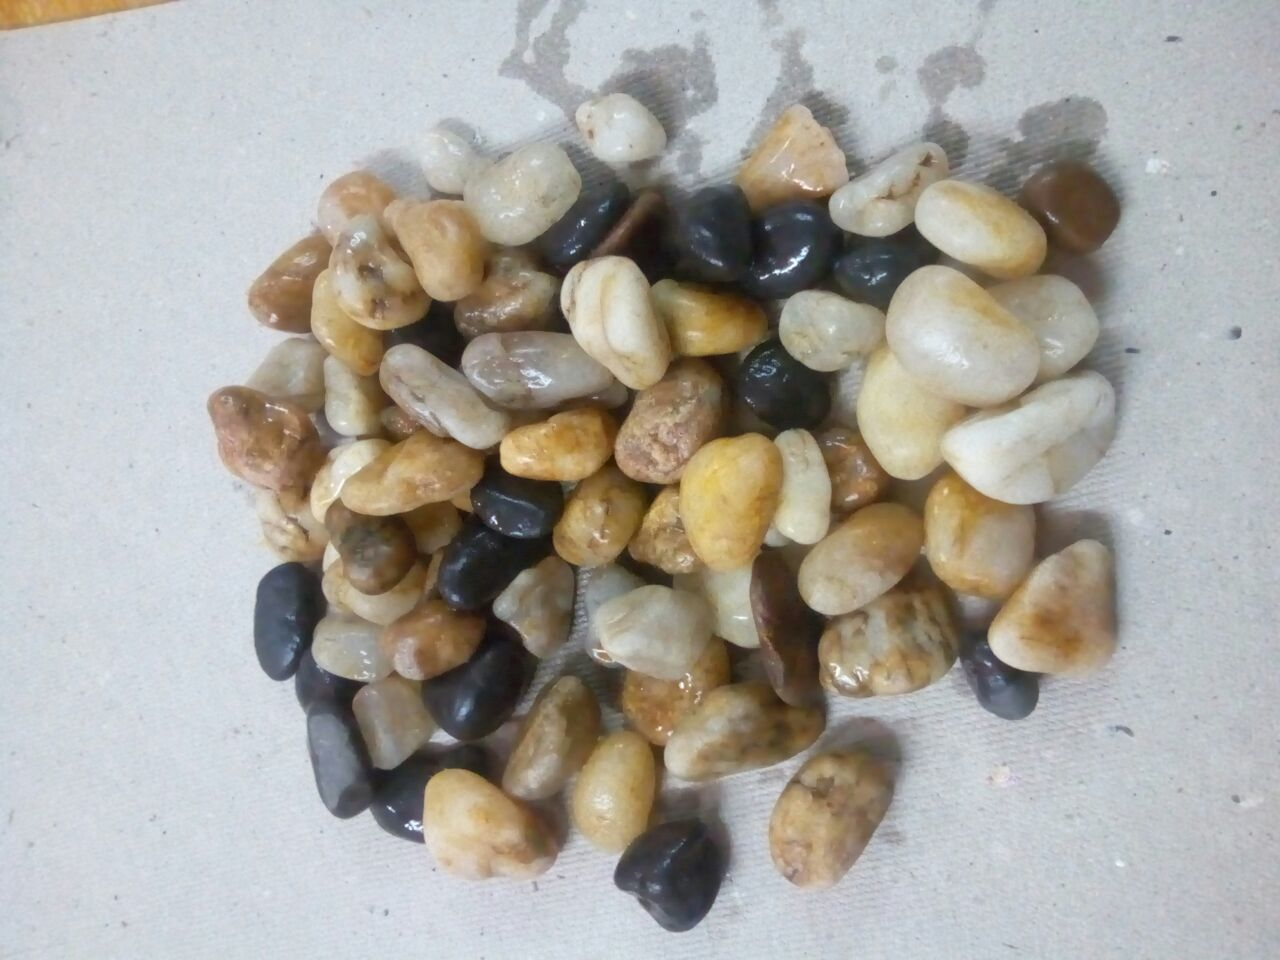 River Gravel / natural gravel / pebble wash